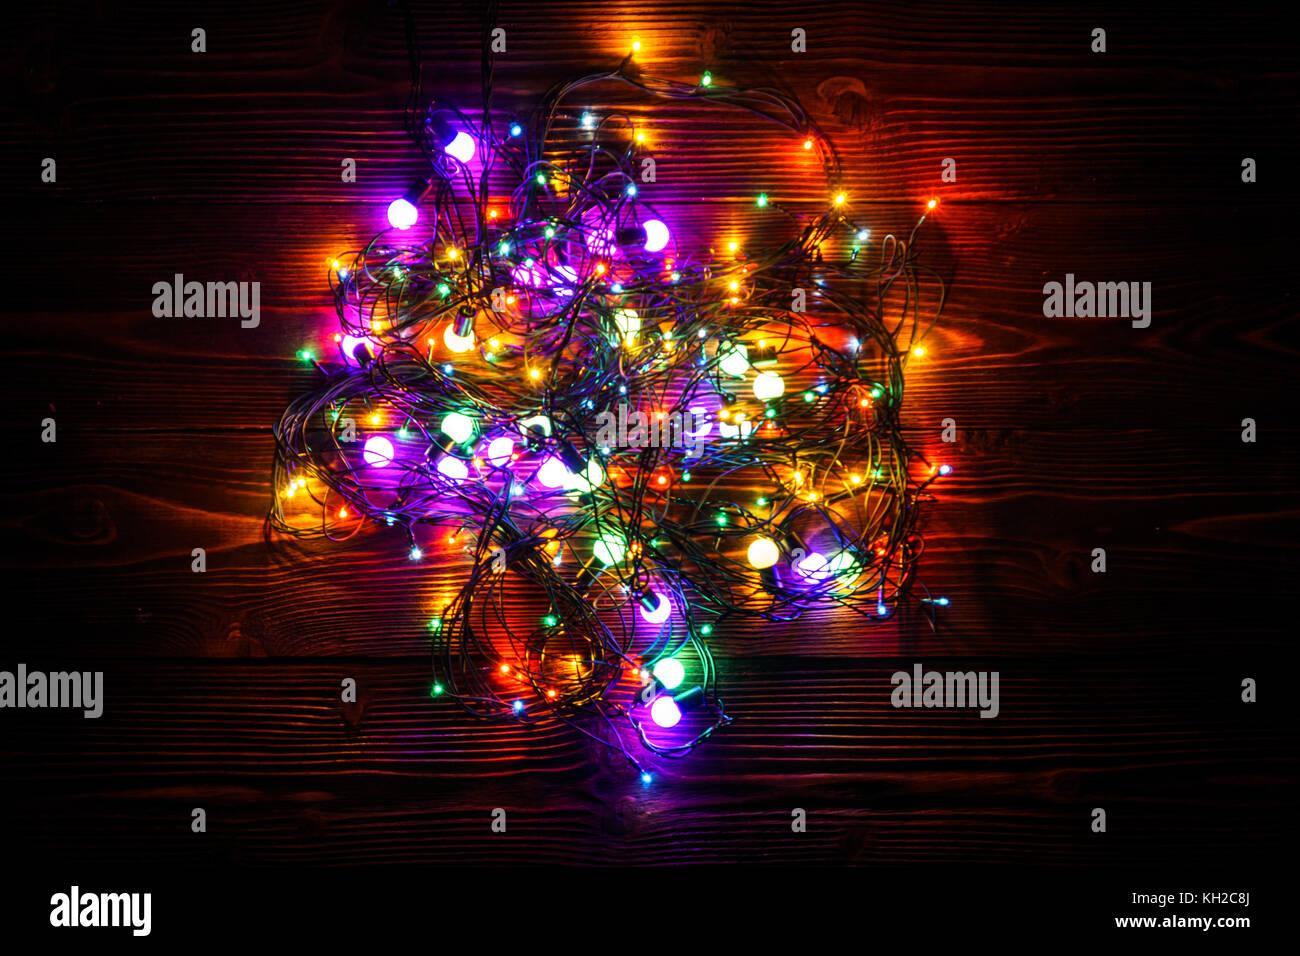 Free Christmas Lights.Wreath And Garlands Of Colored Light Bulbs Christmas